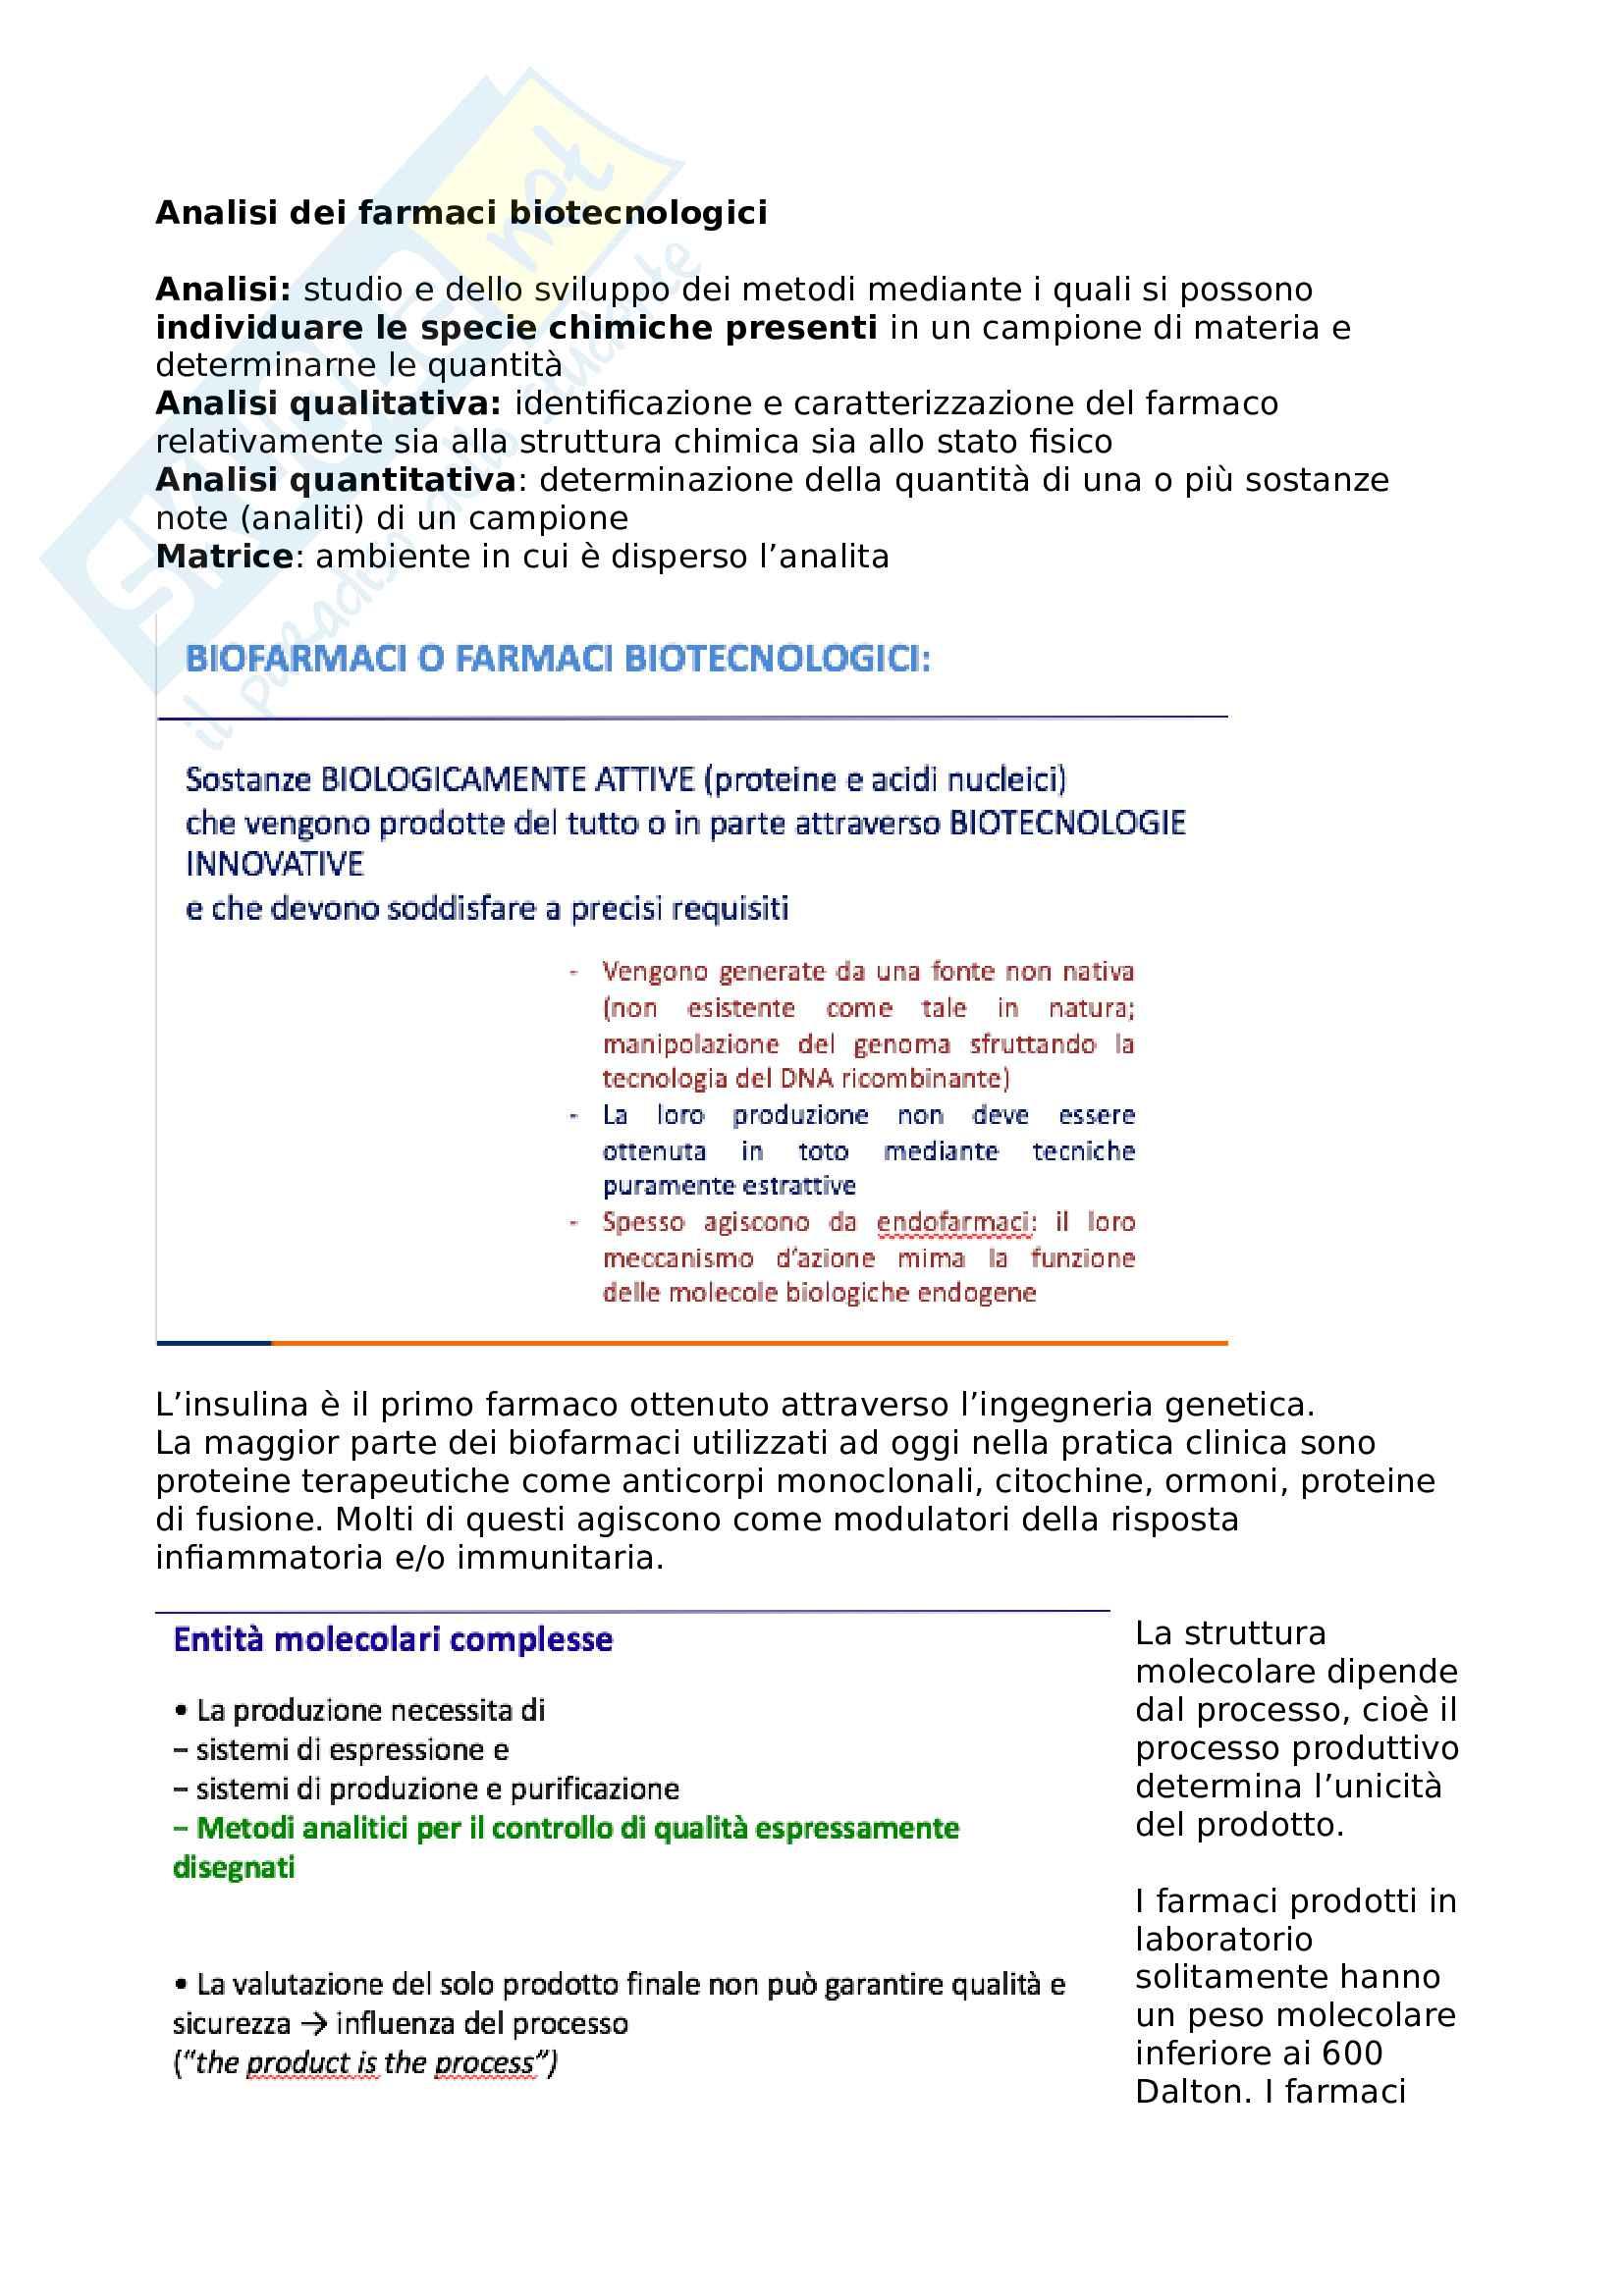 Riassunto esame Analisi dei farmaci biotecnologici, prof. Regazzoni